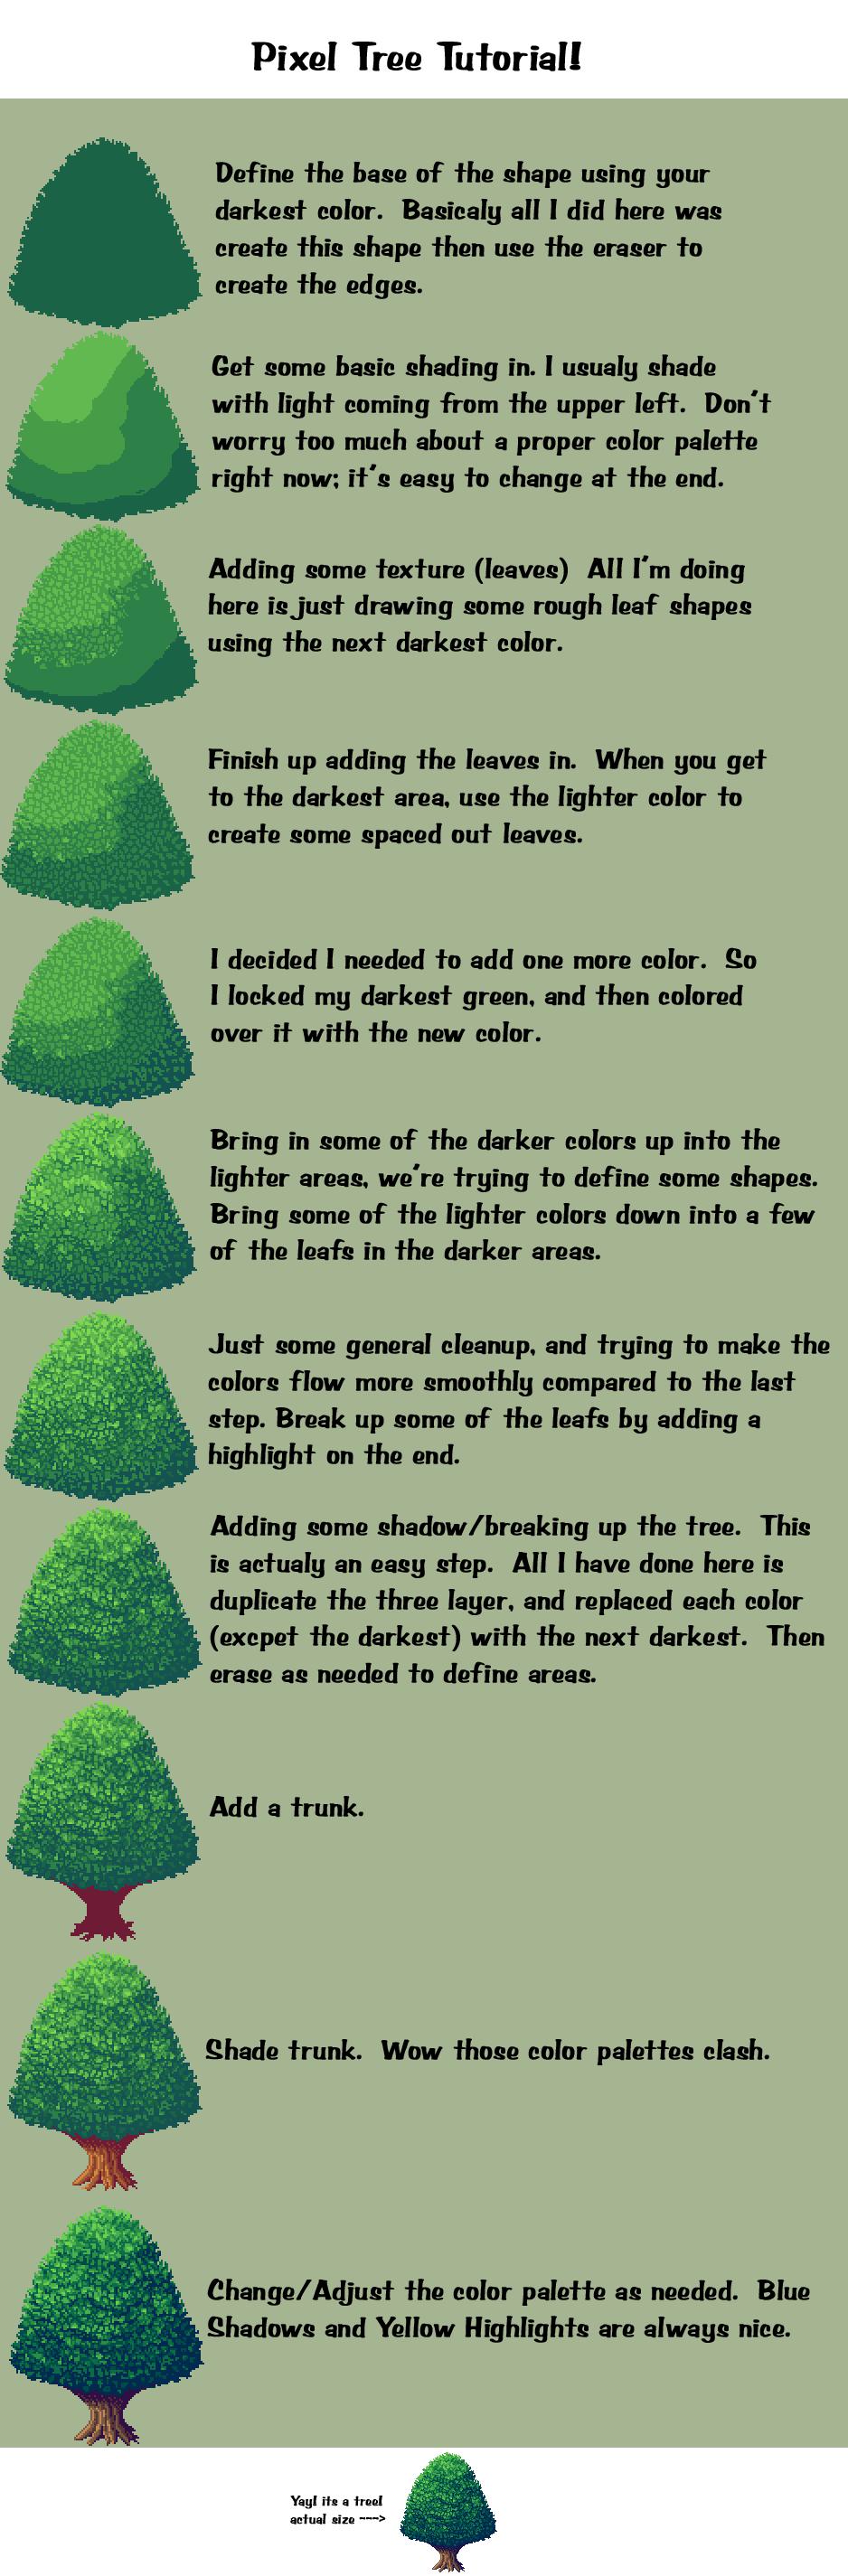 how to make pixel art